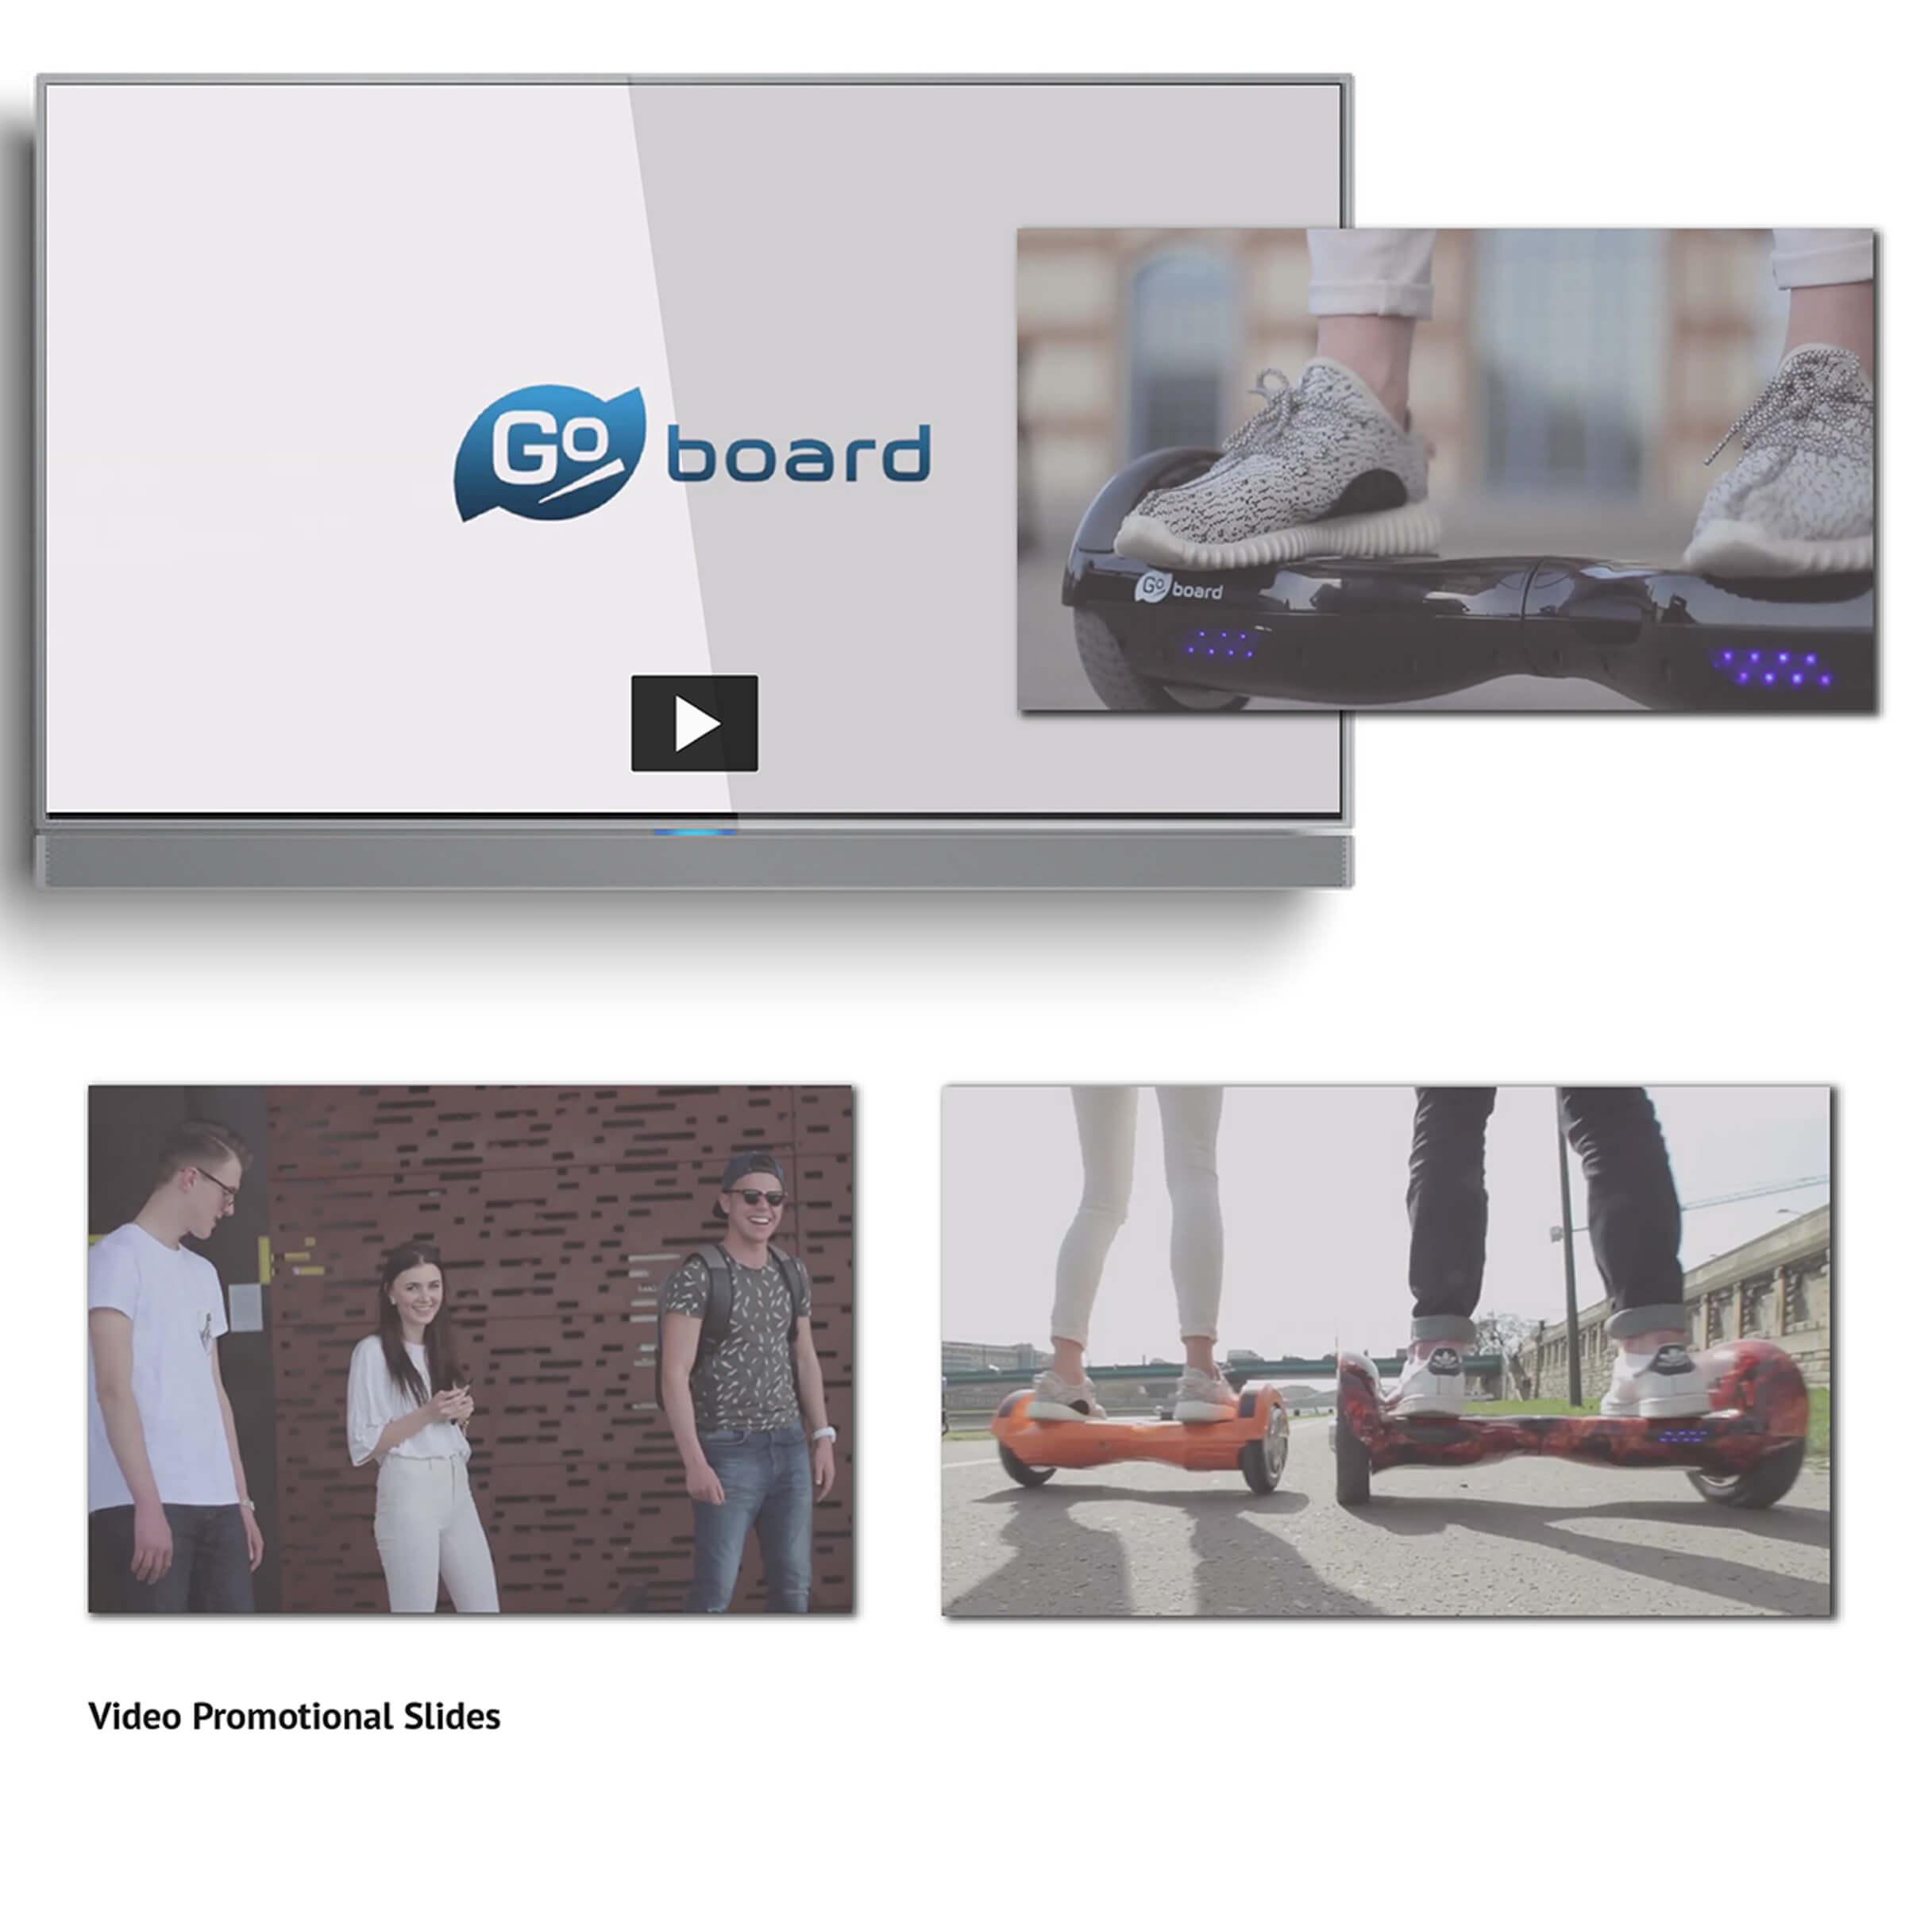 J2-Graphic-design-corporate-identity